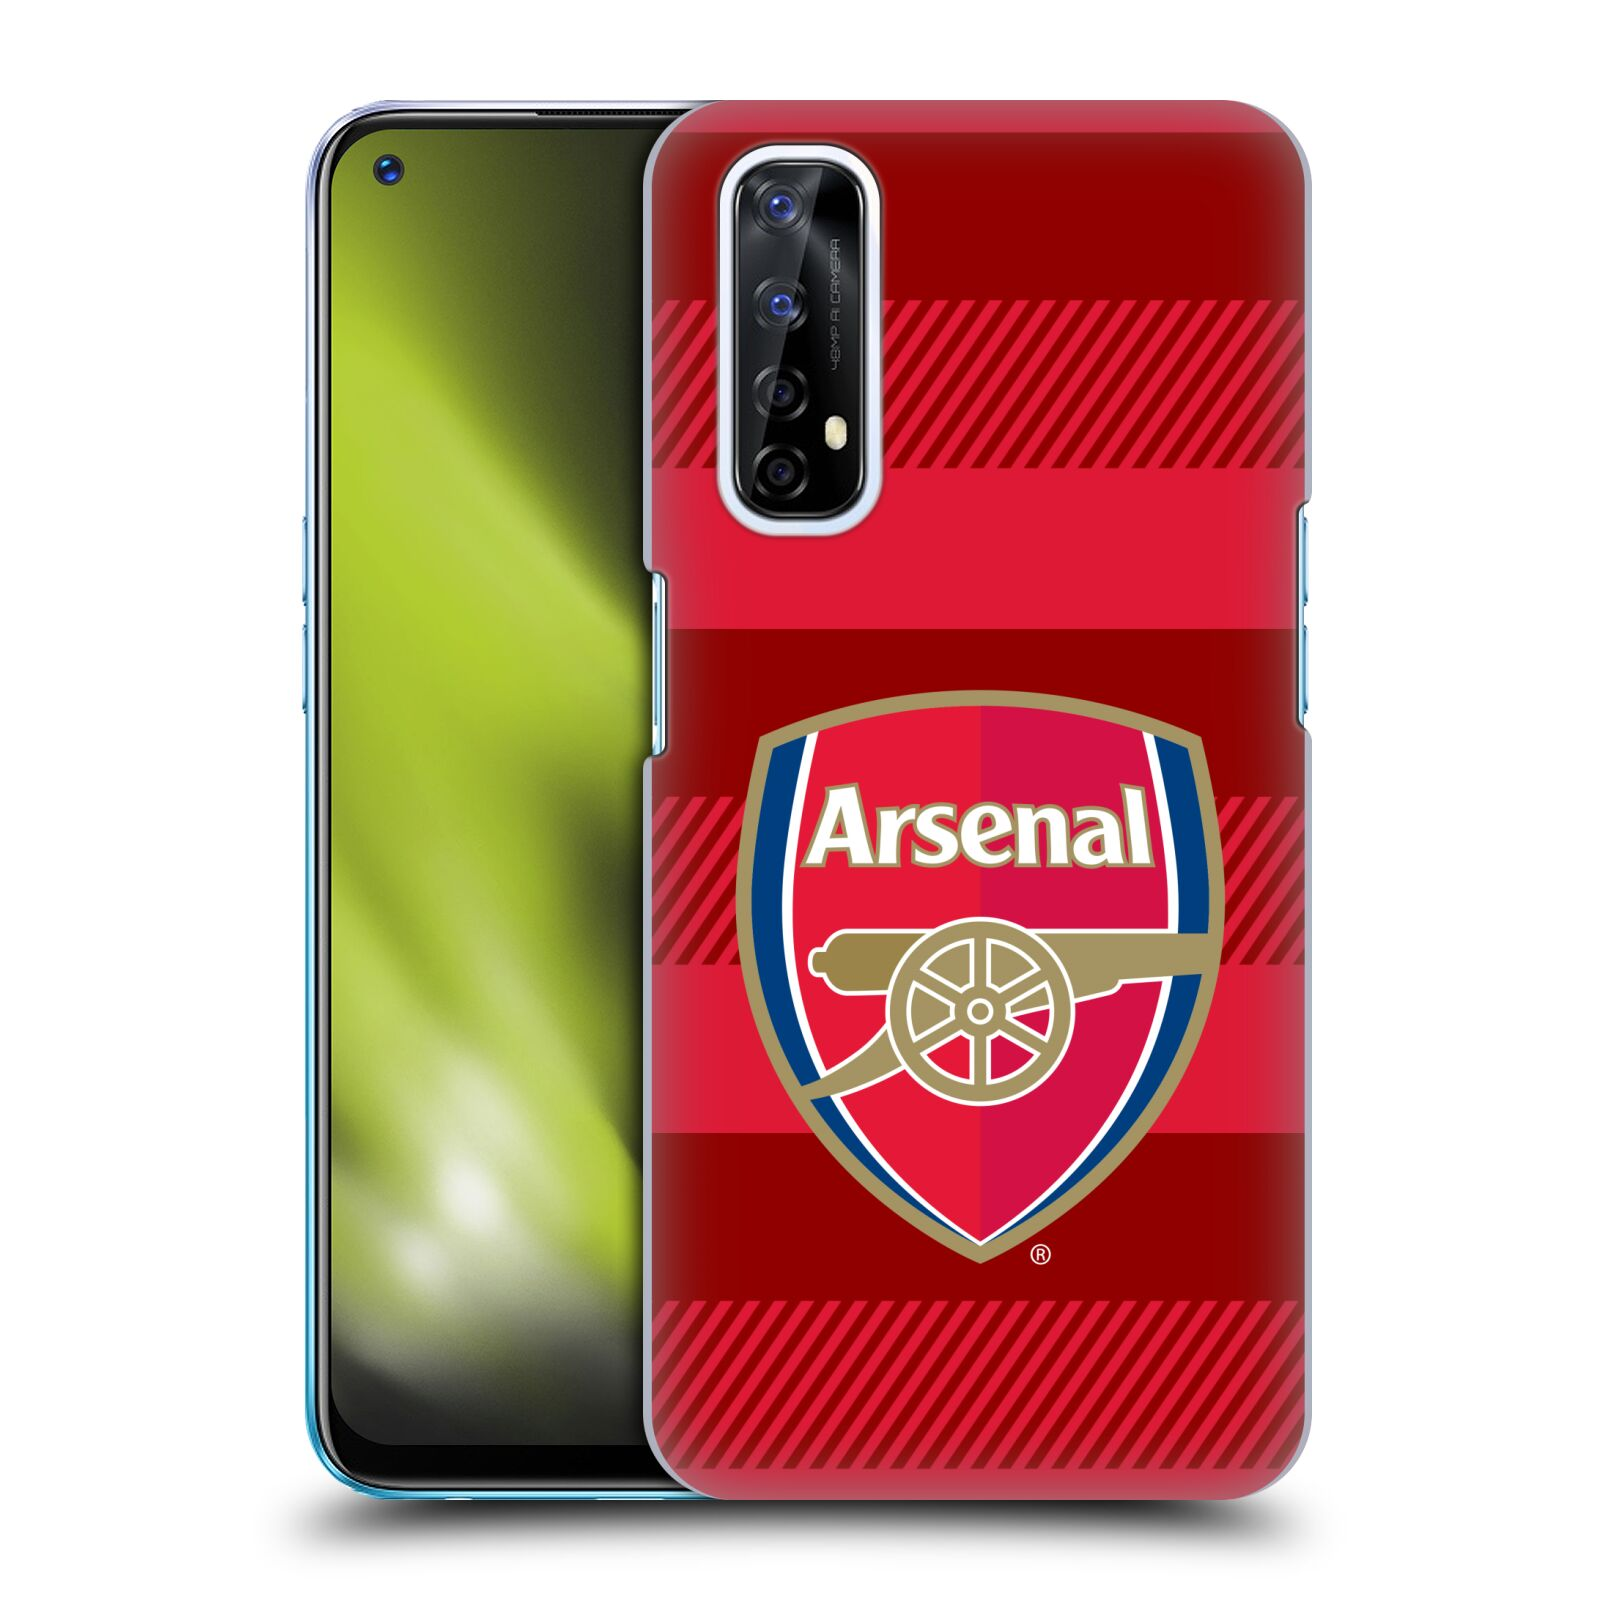 Plastové pouzdro na mobil Realme 7 - Head Case - Arsenal FC - Logo s pruhy